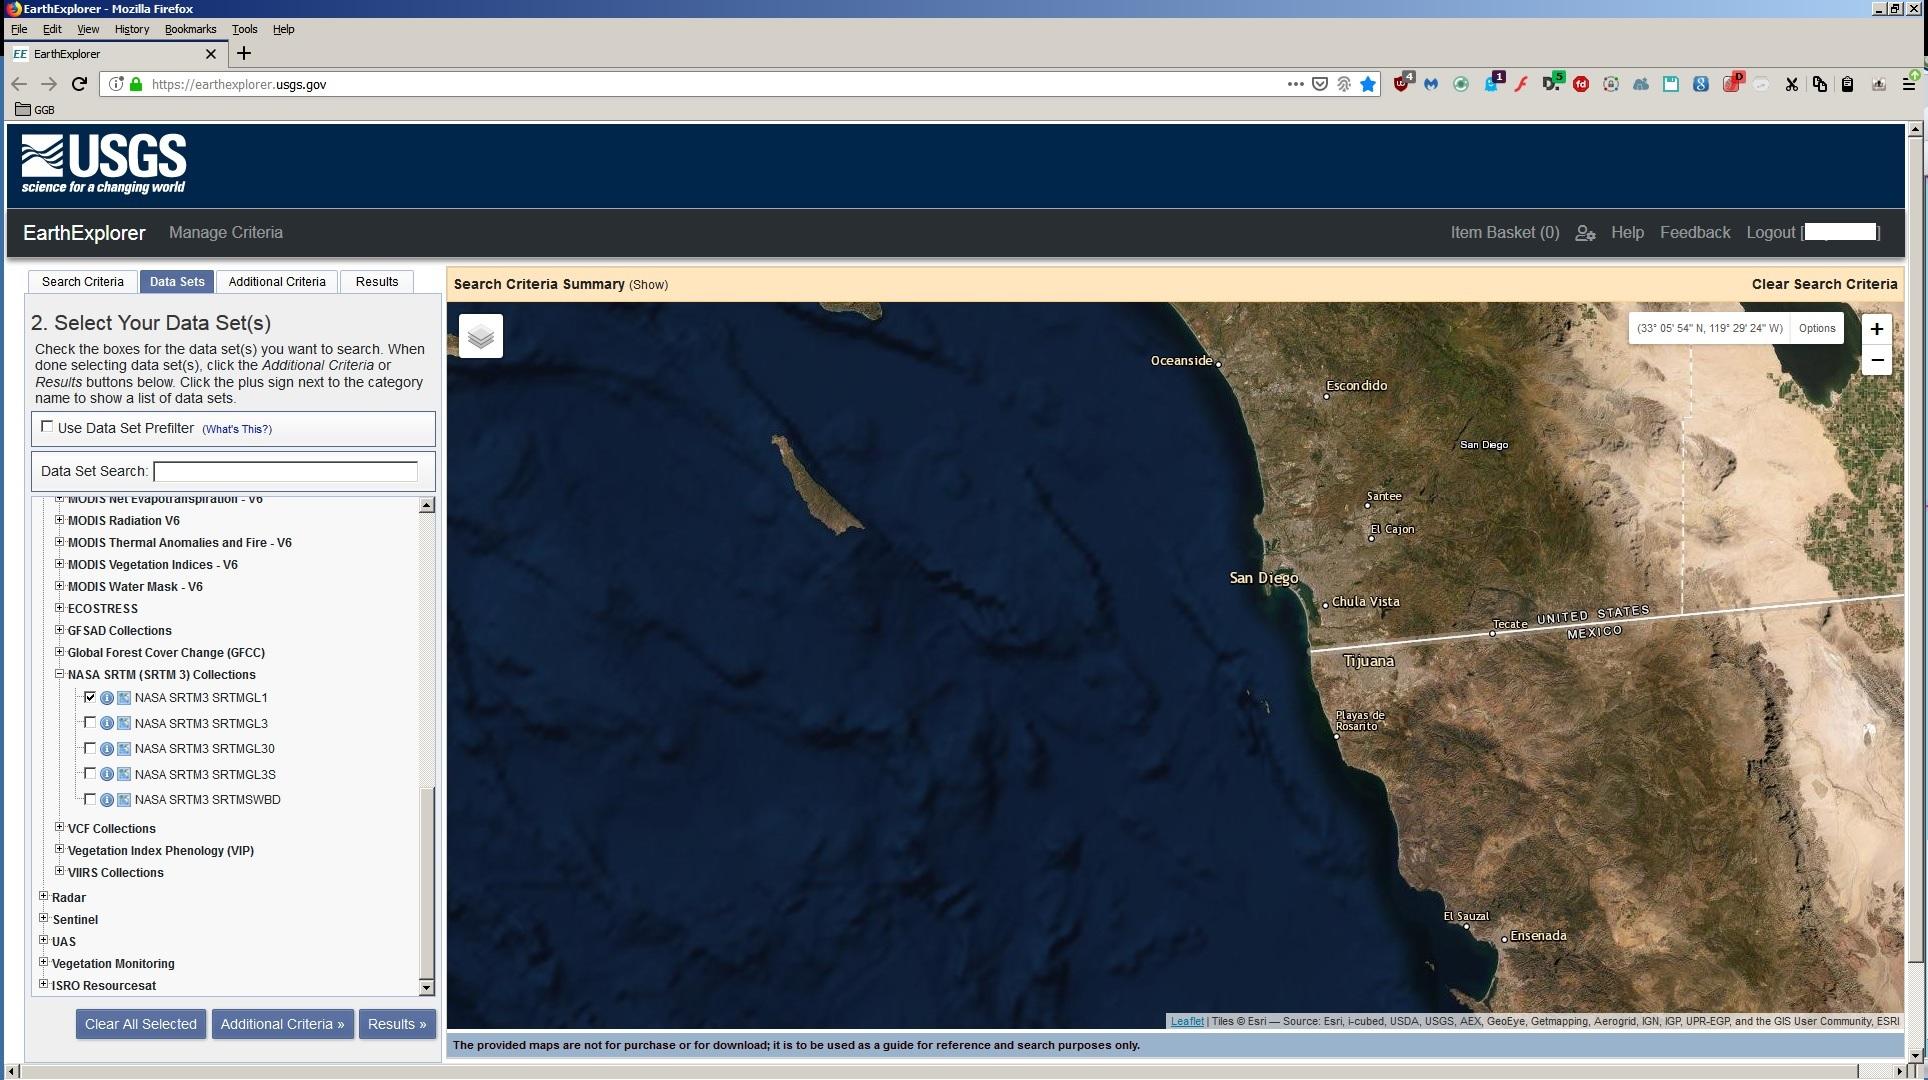 earthexplorer_nasa_srtm3_srtmgml1_data_sets-jpg.66279